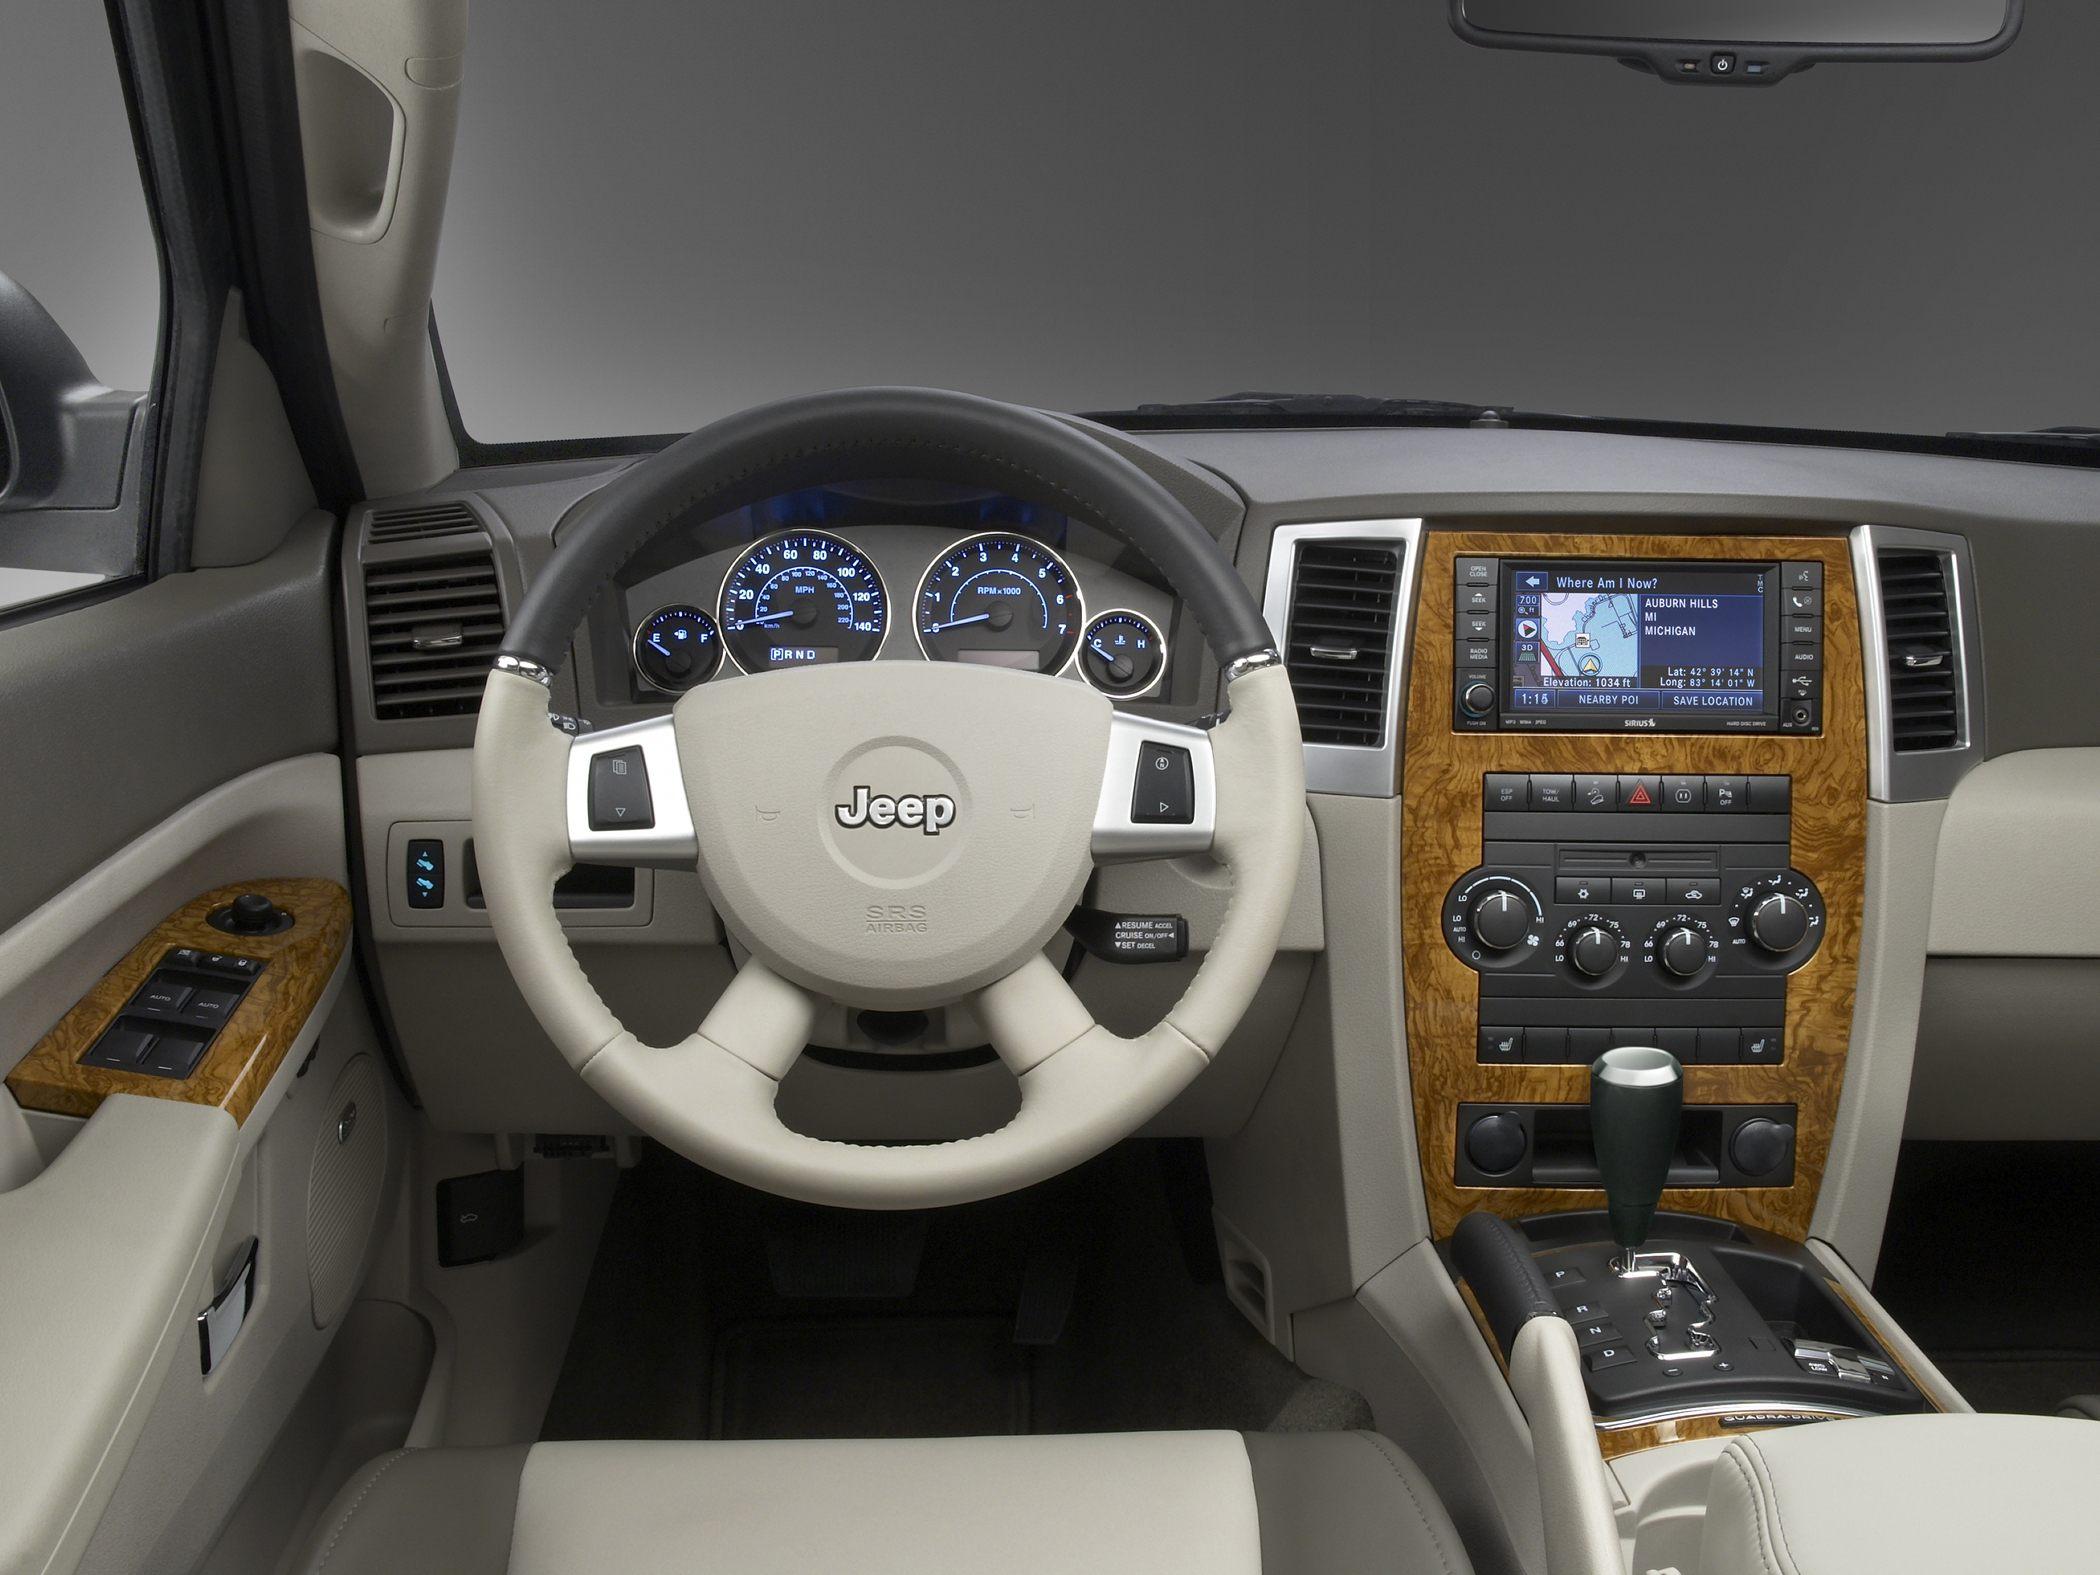 Jeep-Grand-Cherokee-2010-interior